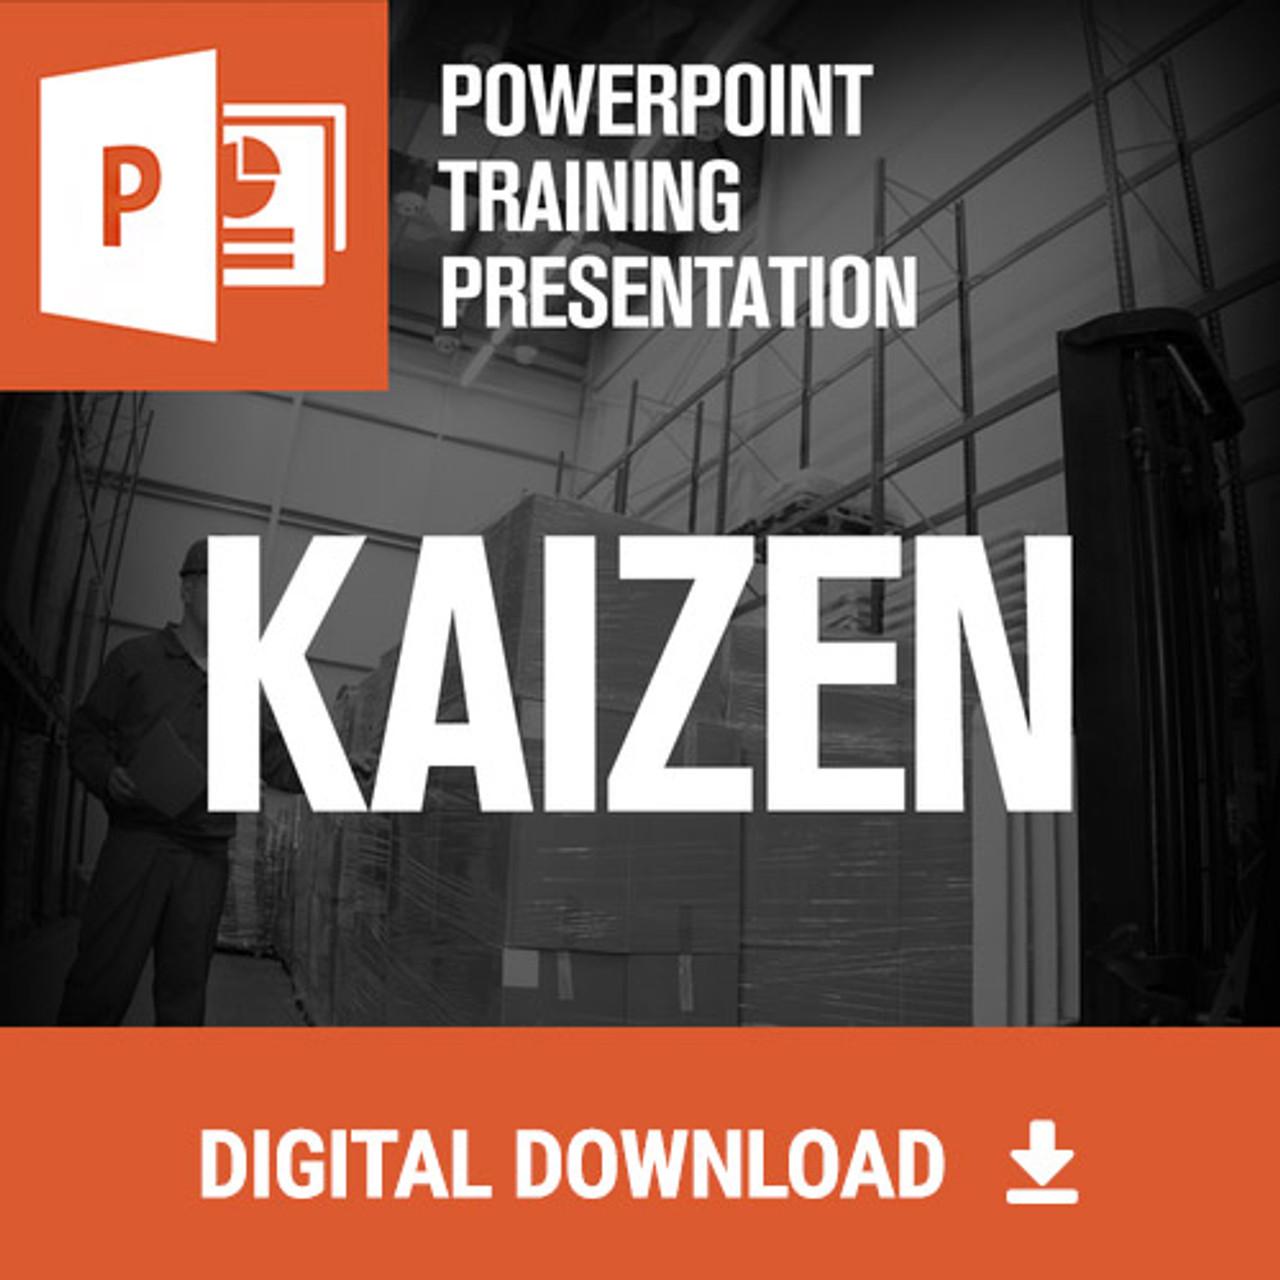 Kaizen Powerpoint Training - Digital Download